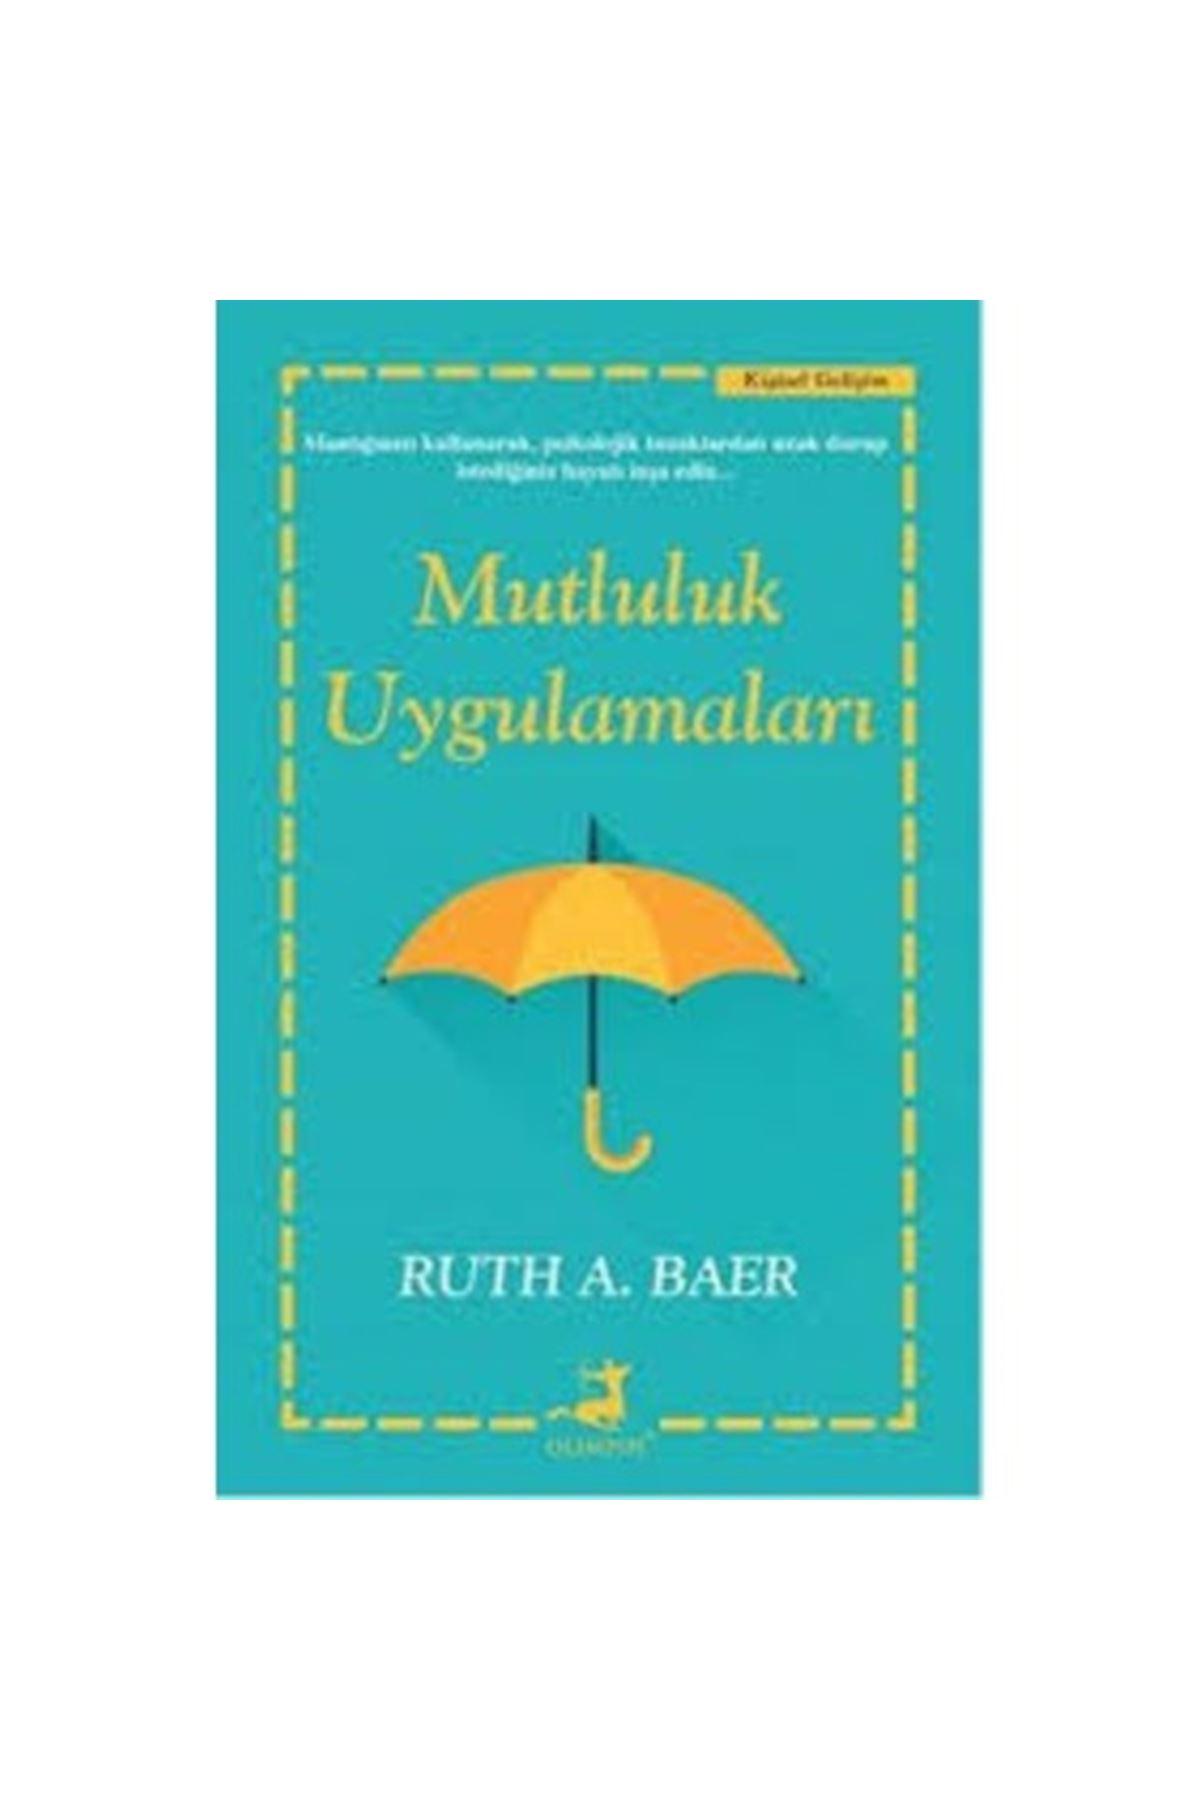 RUTH A. BAER - MUTLULUK UYGULAMALARI